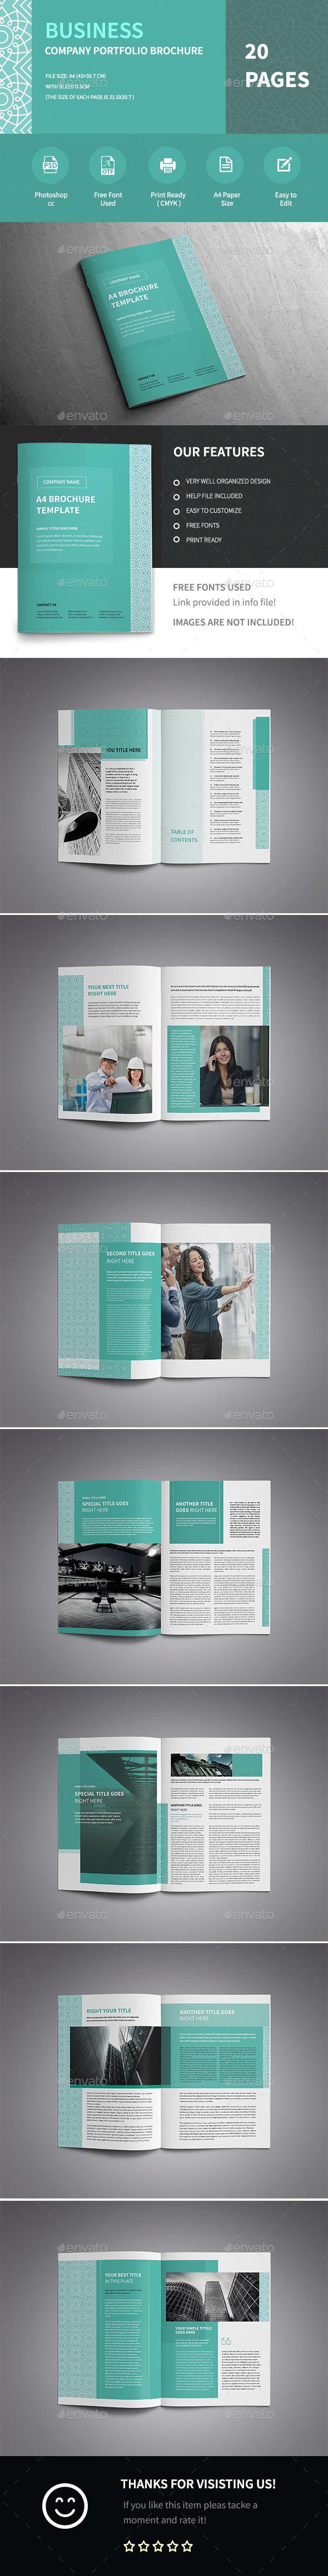 Modern A4 Corporate Business Brochure Template  - Corporate Brochures